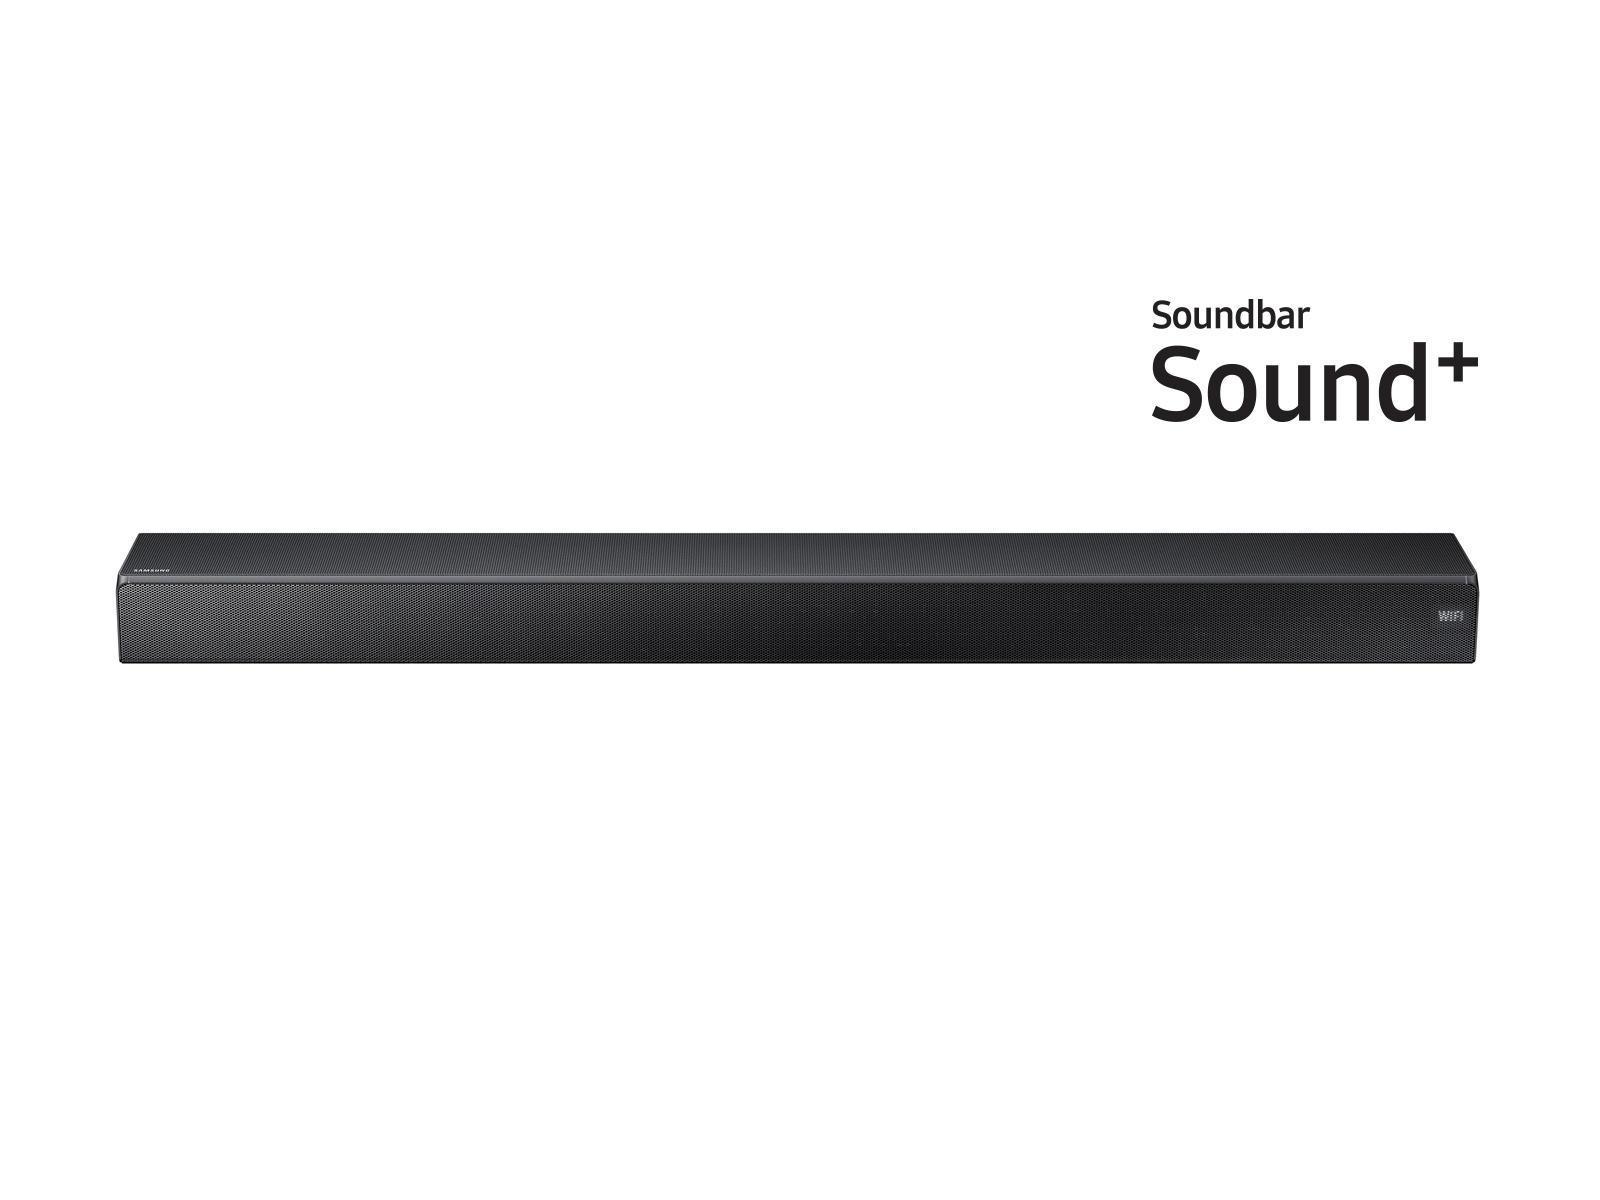 HW-MS750 Sound+ Premium Soundbar